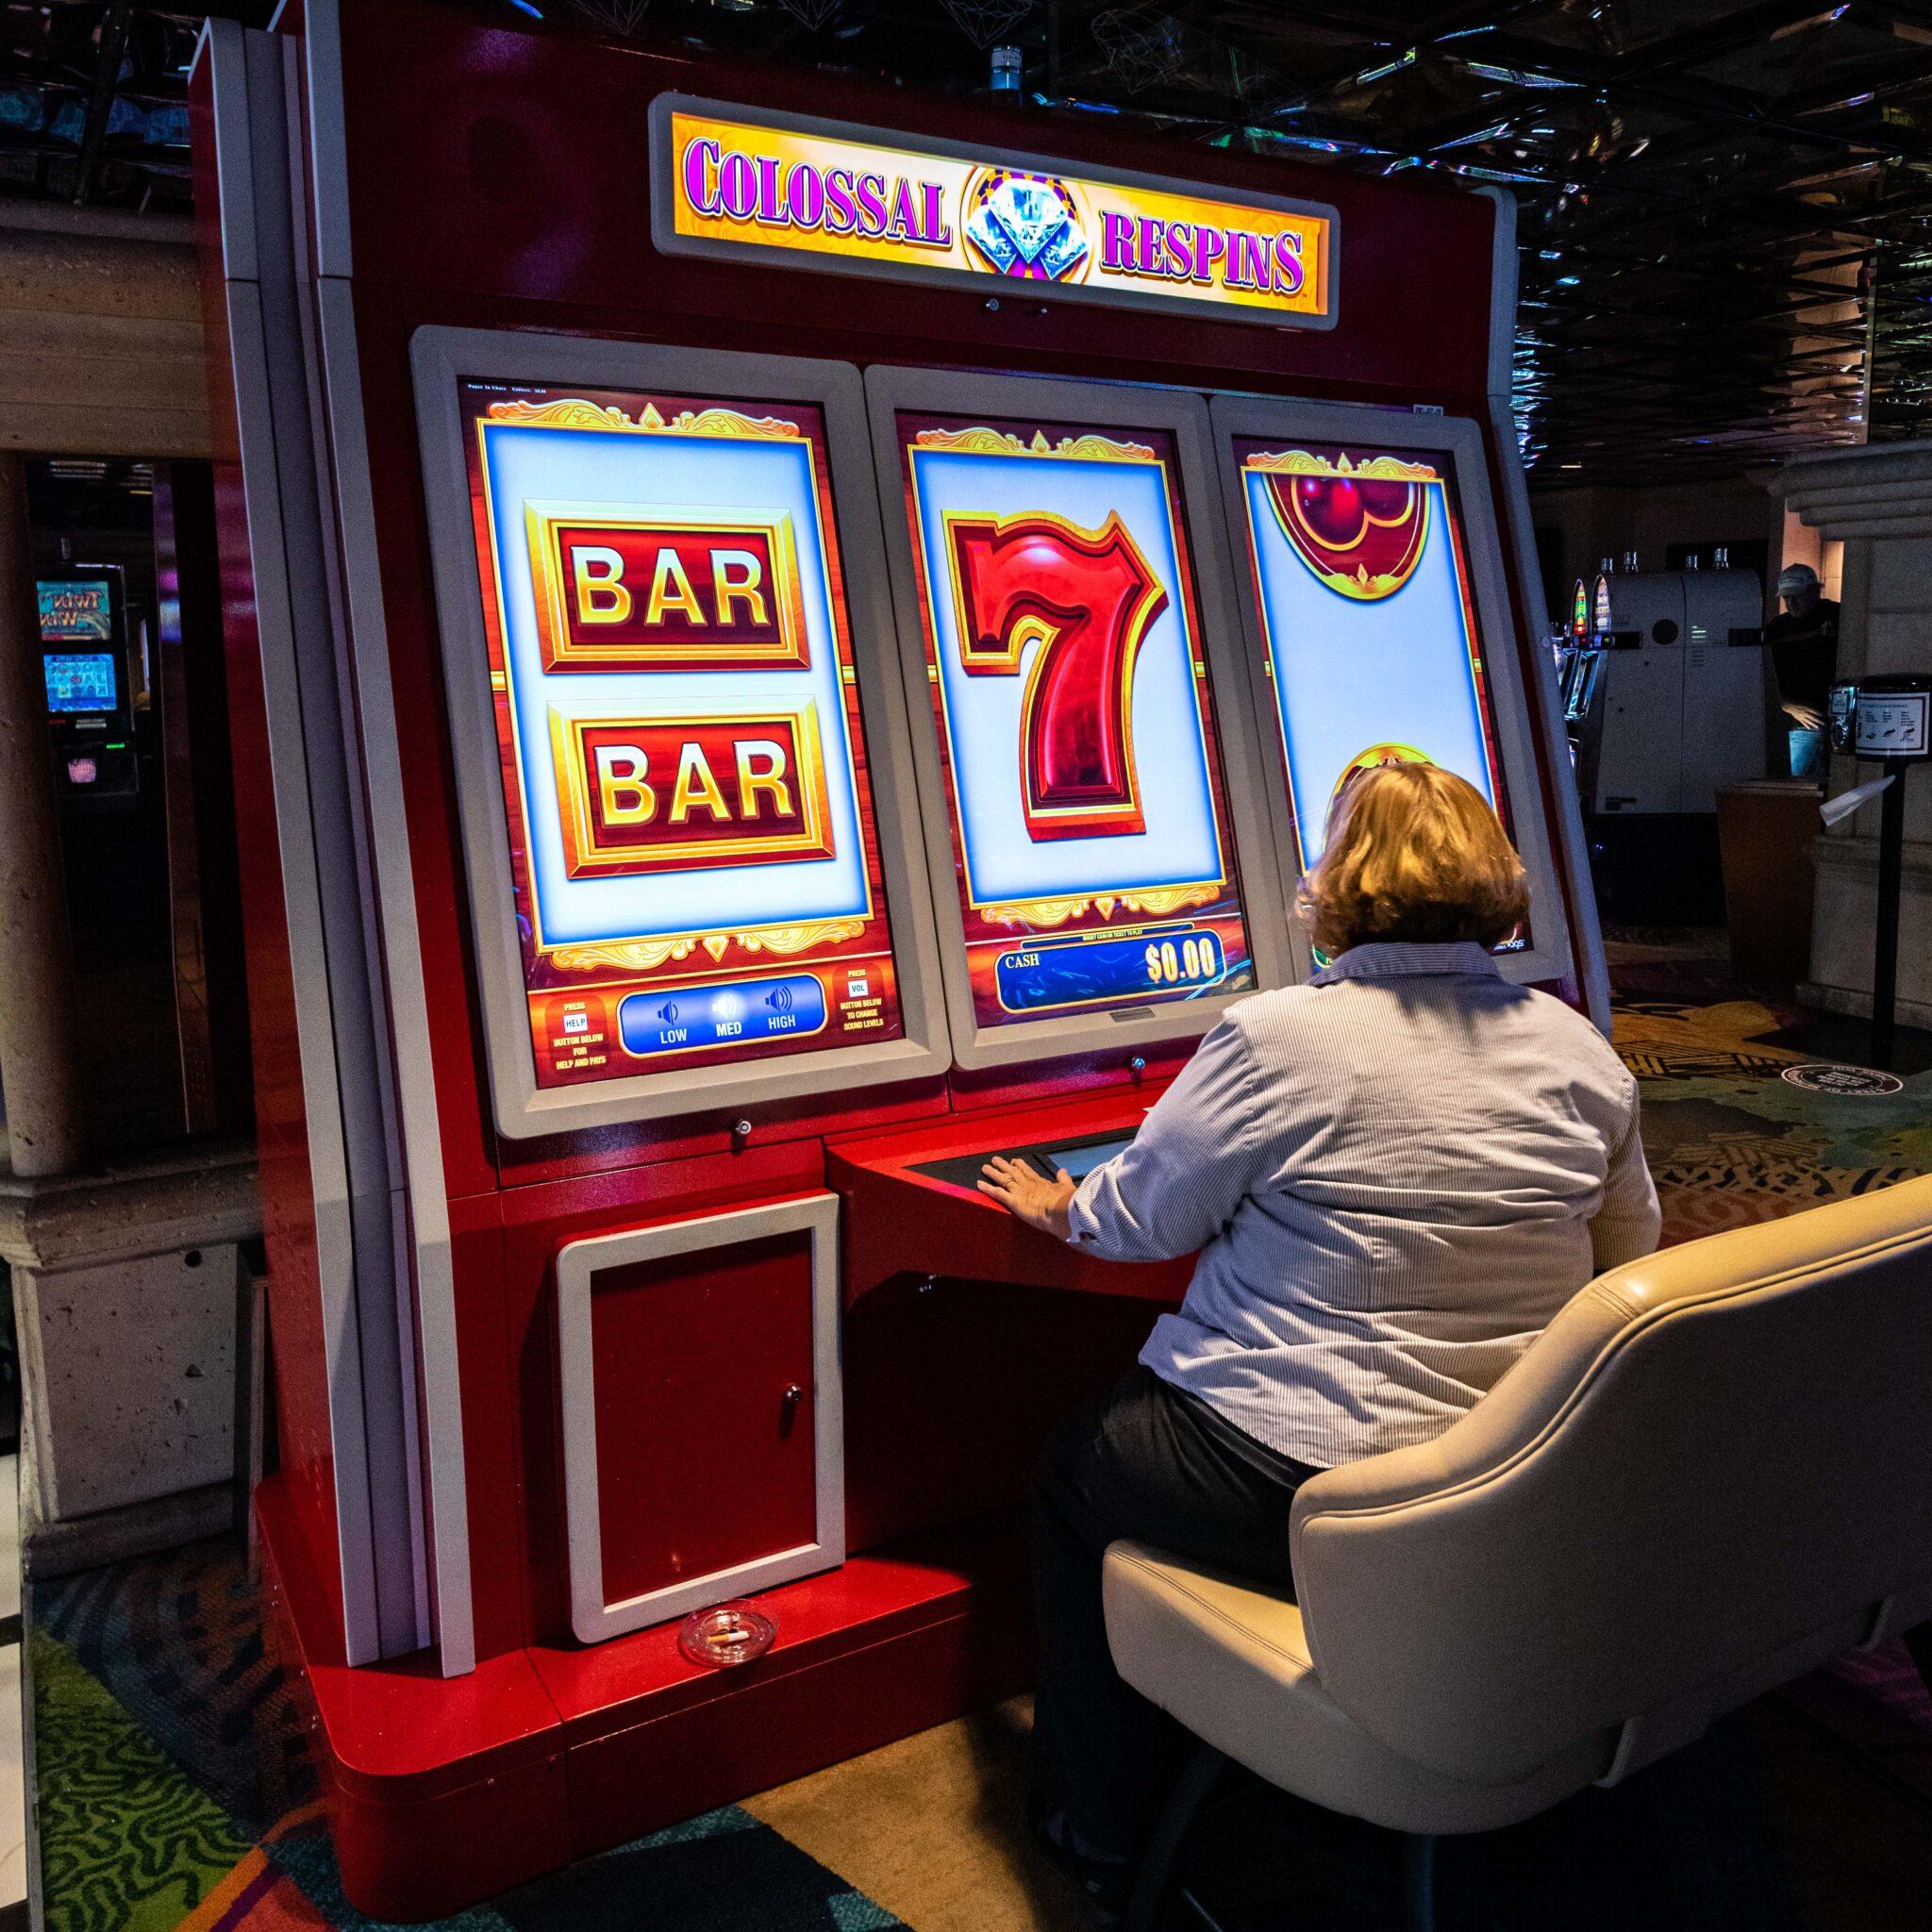 woman, slot machine, gigantic, funny, red, reno in transition, atlantis casino, chris allan, covid transition time for Reno